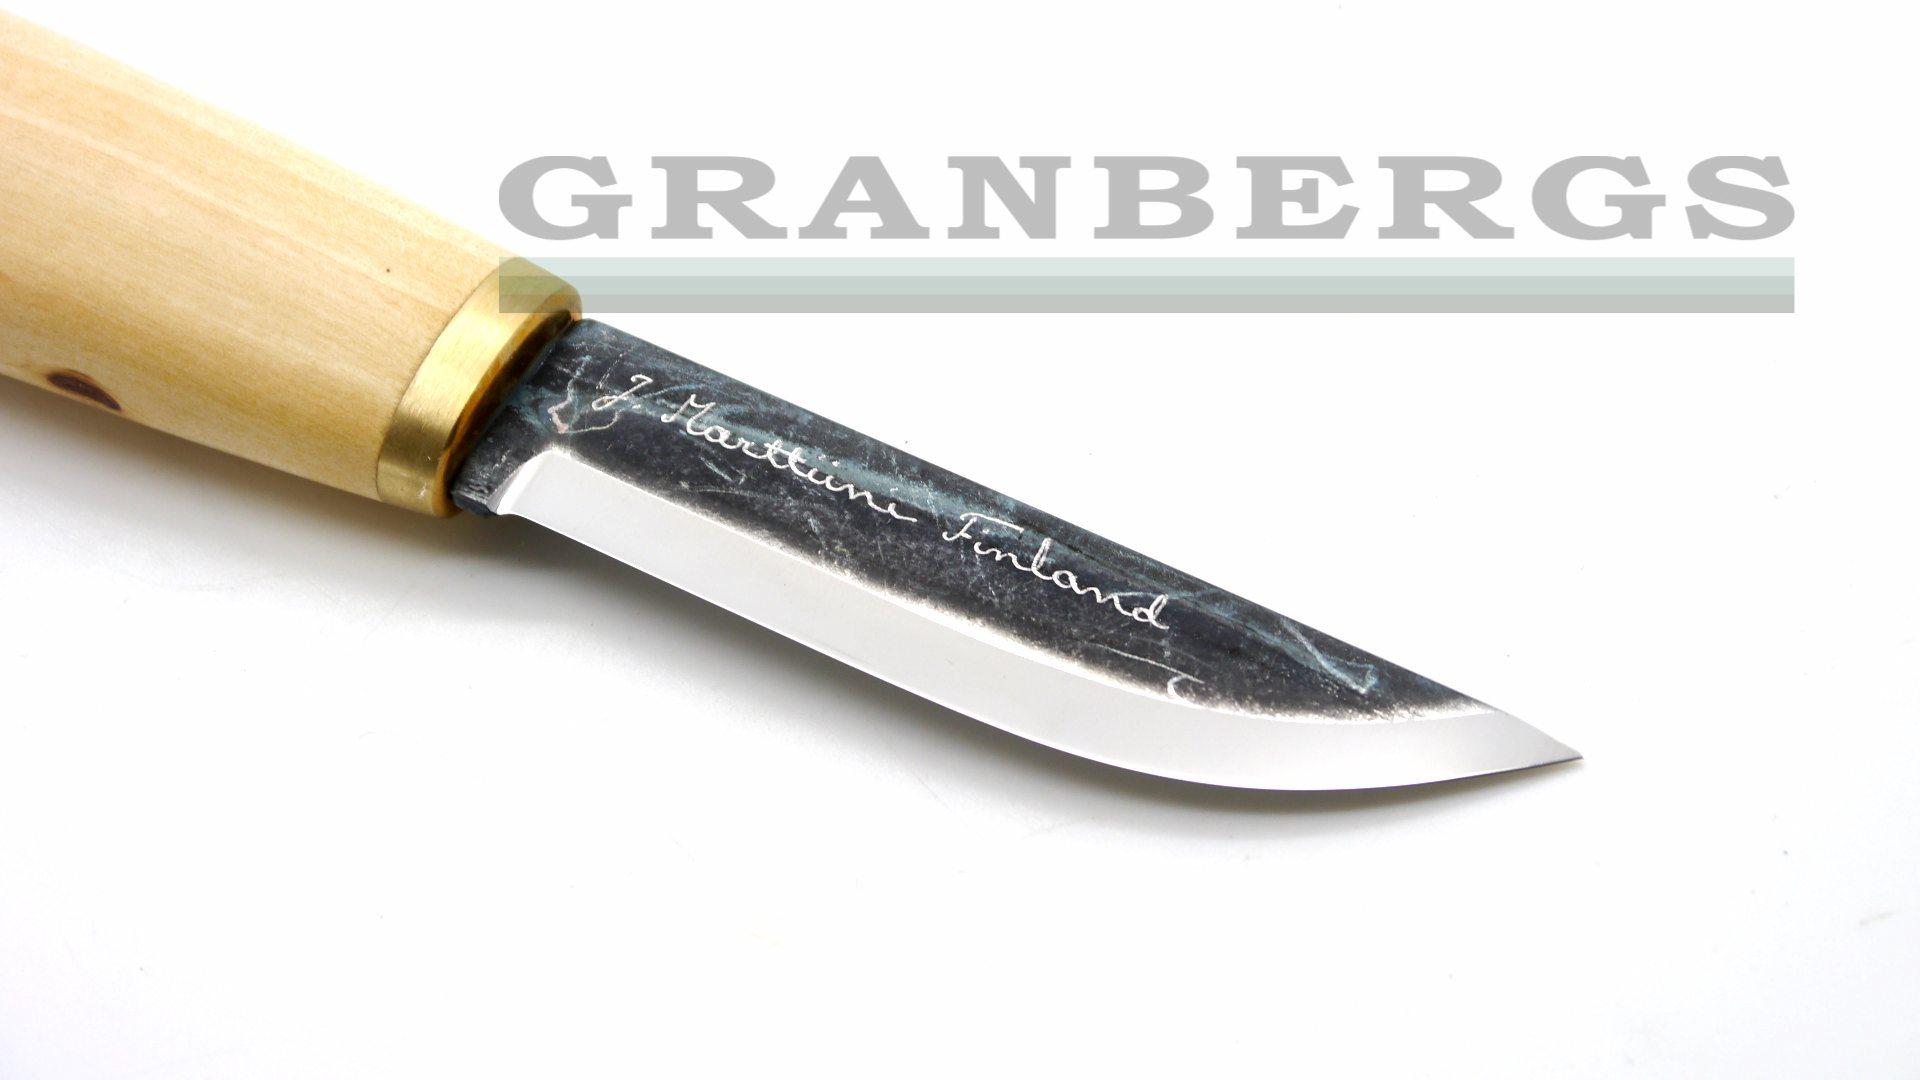 Granbergs - Marttiini Arctic Carving Knife 535010